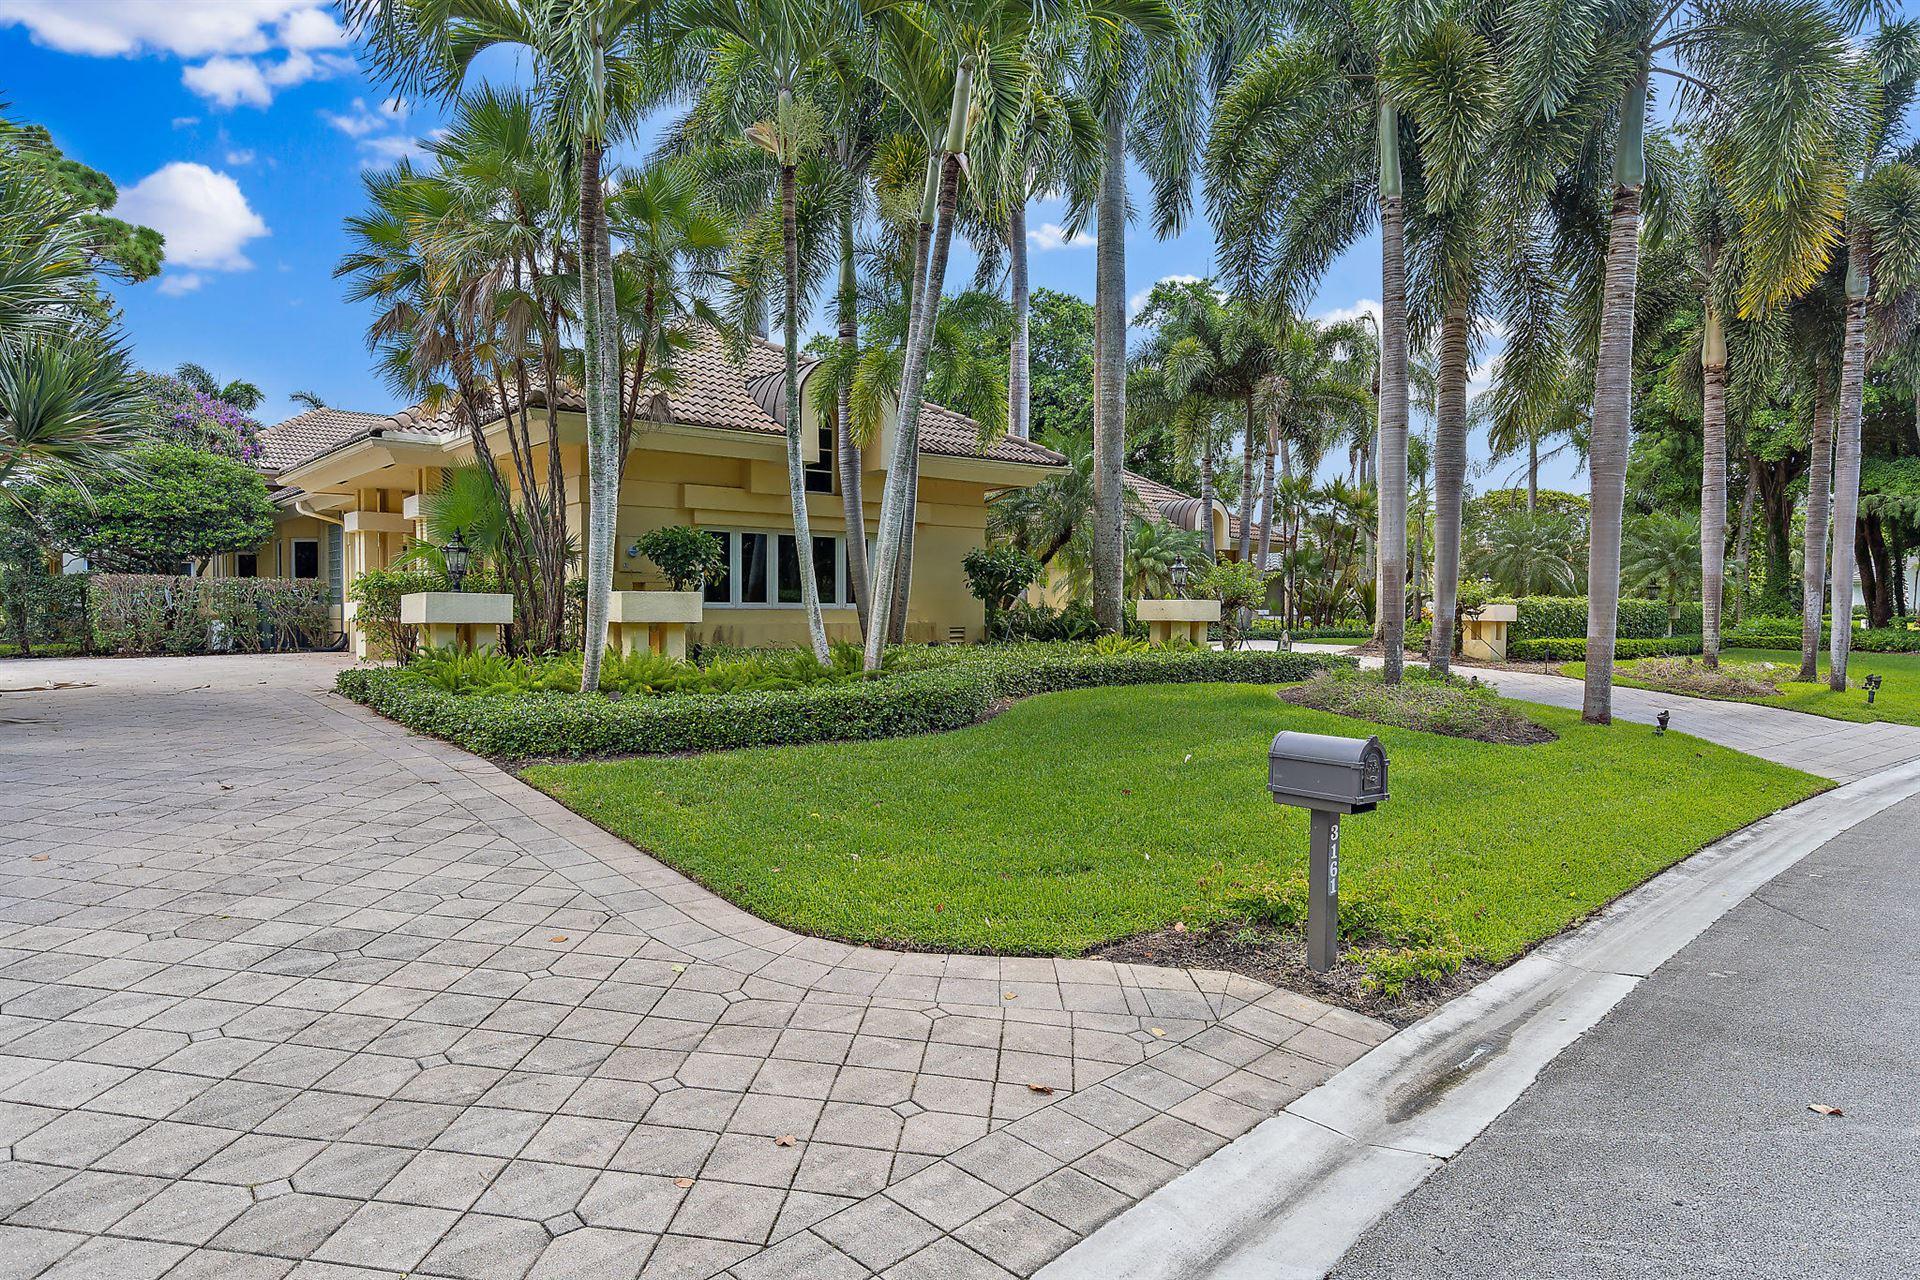 Photo of 3161 Monet Drive W, Palm Beach Gardens, FL 33410 (MLS # RX-10640473)